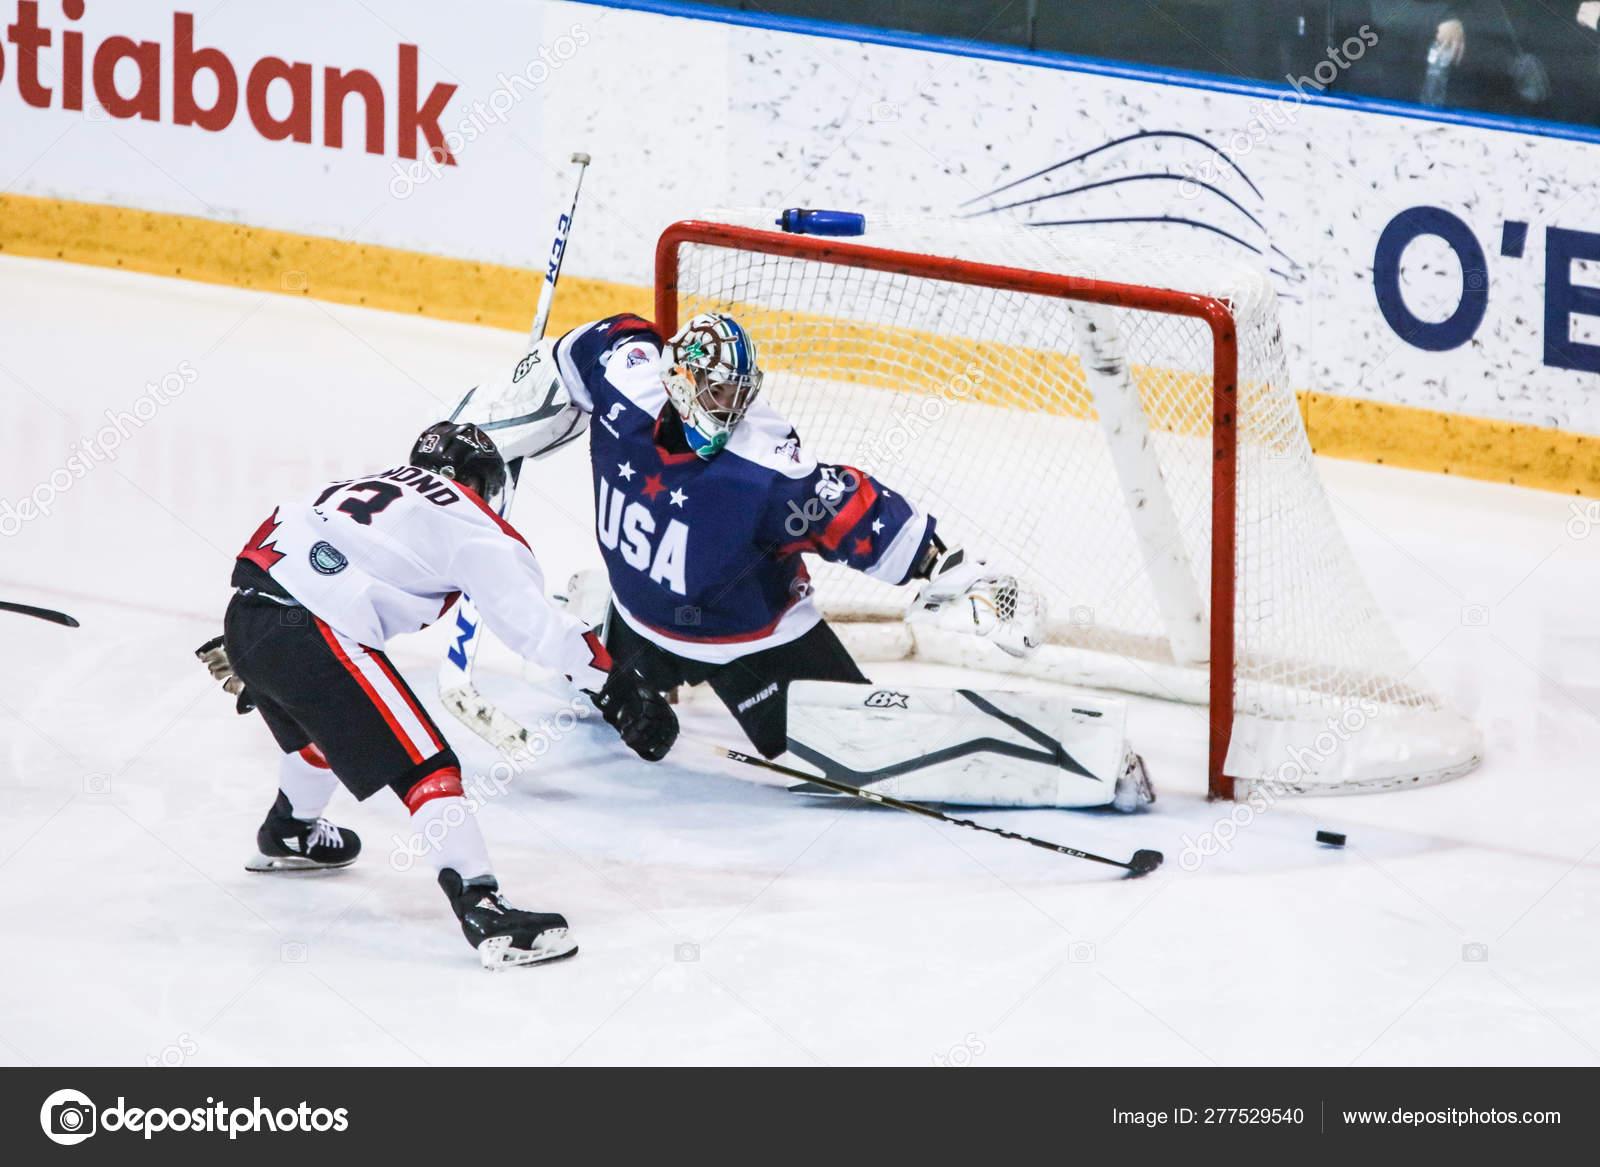 2019 Ice Hockey Classic Melbourne Australia – Stock